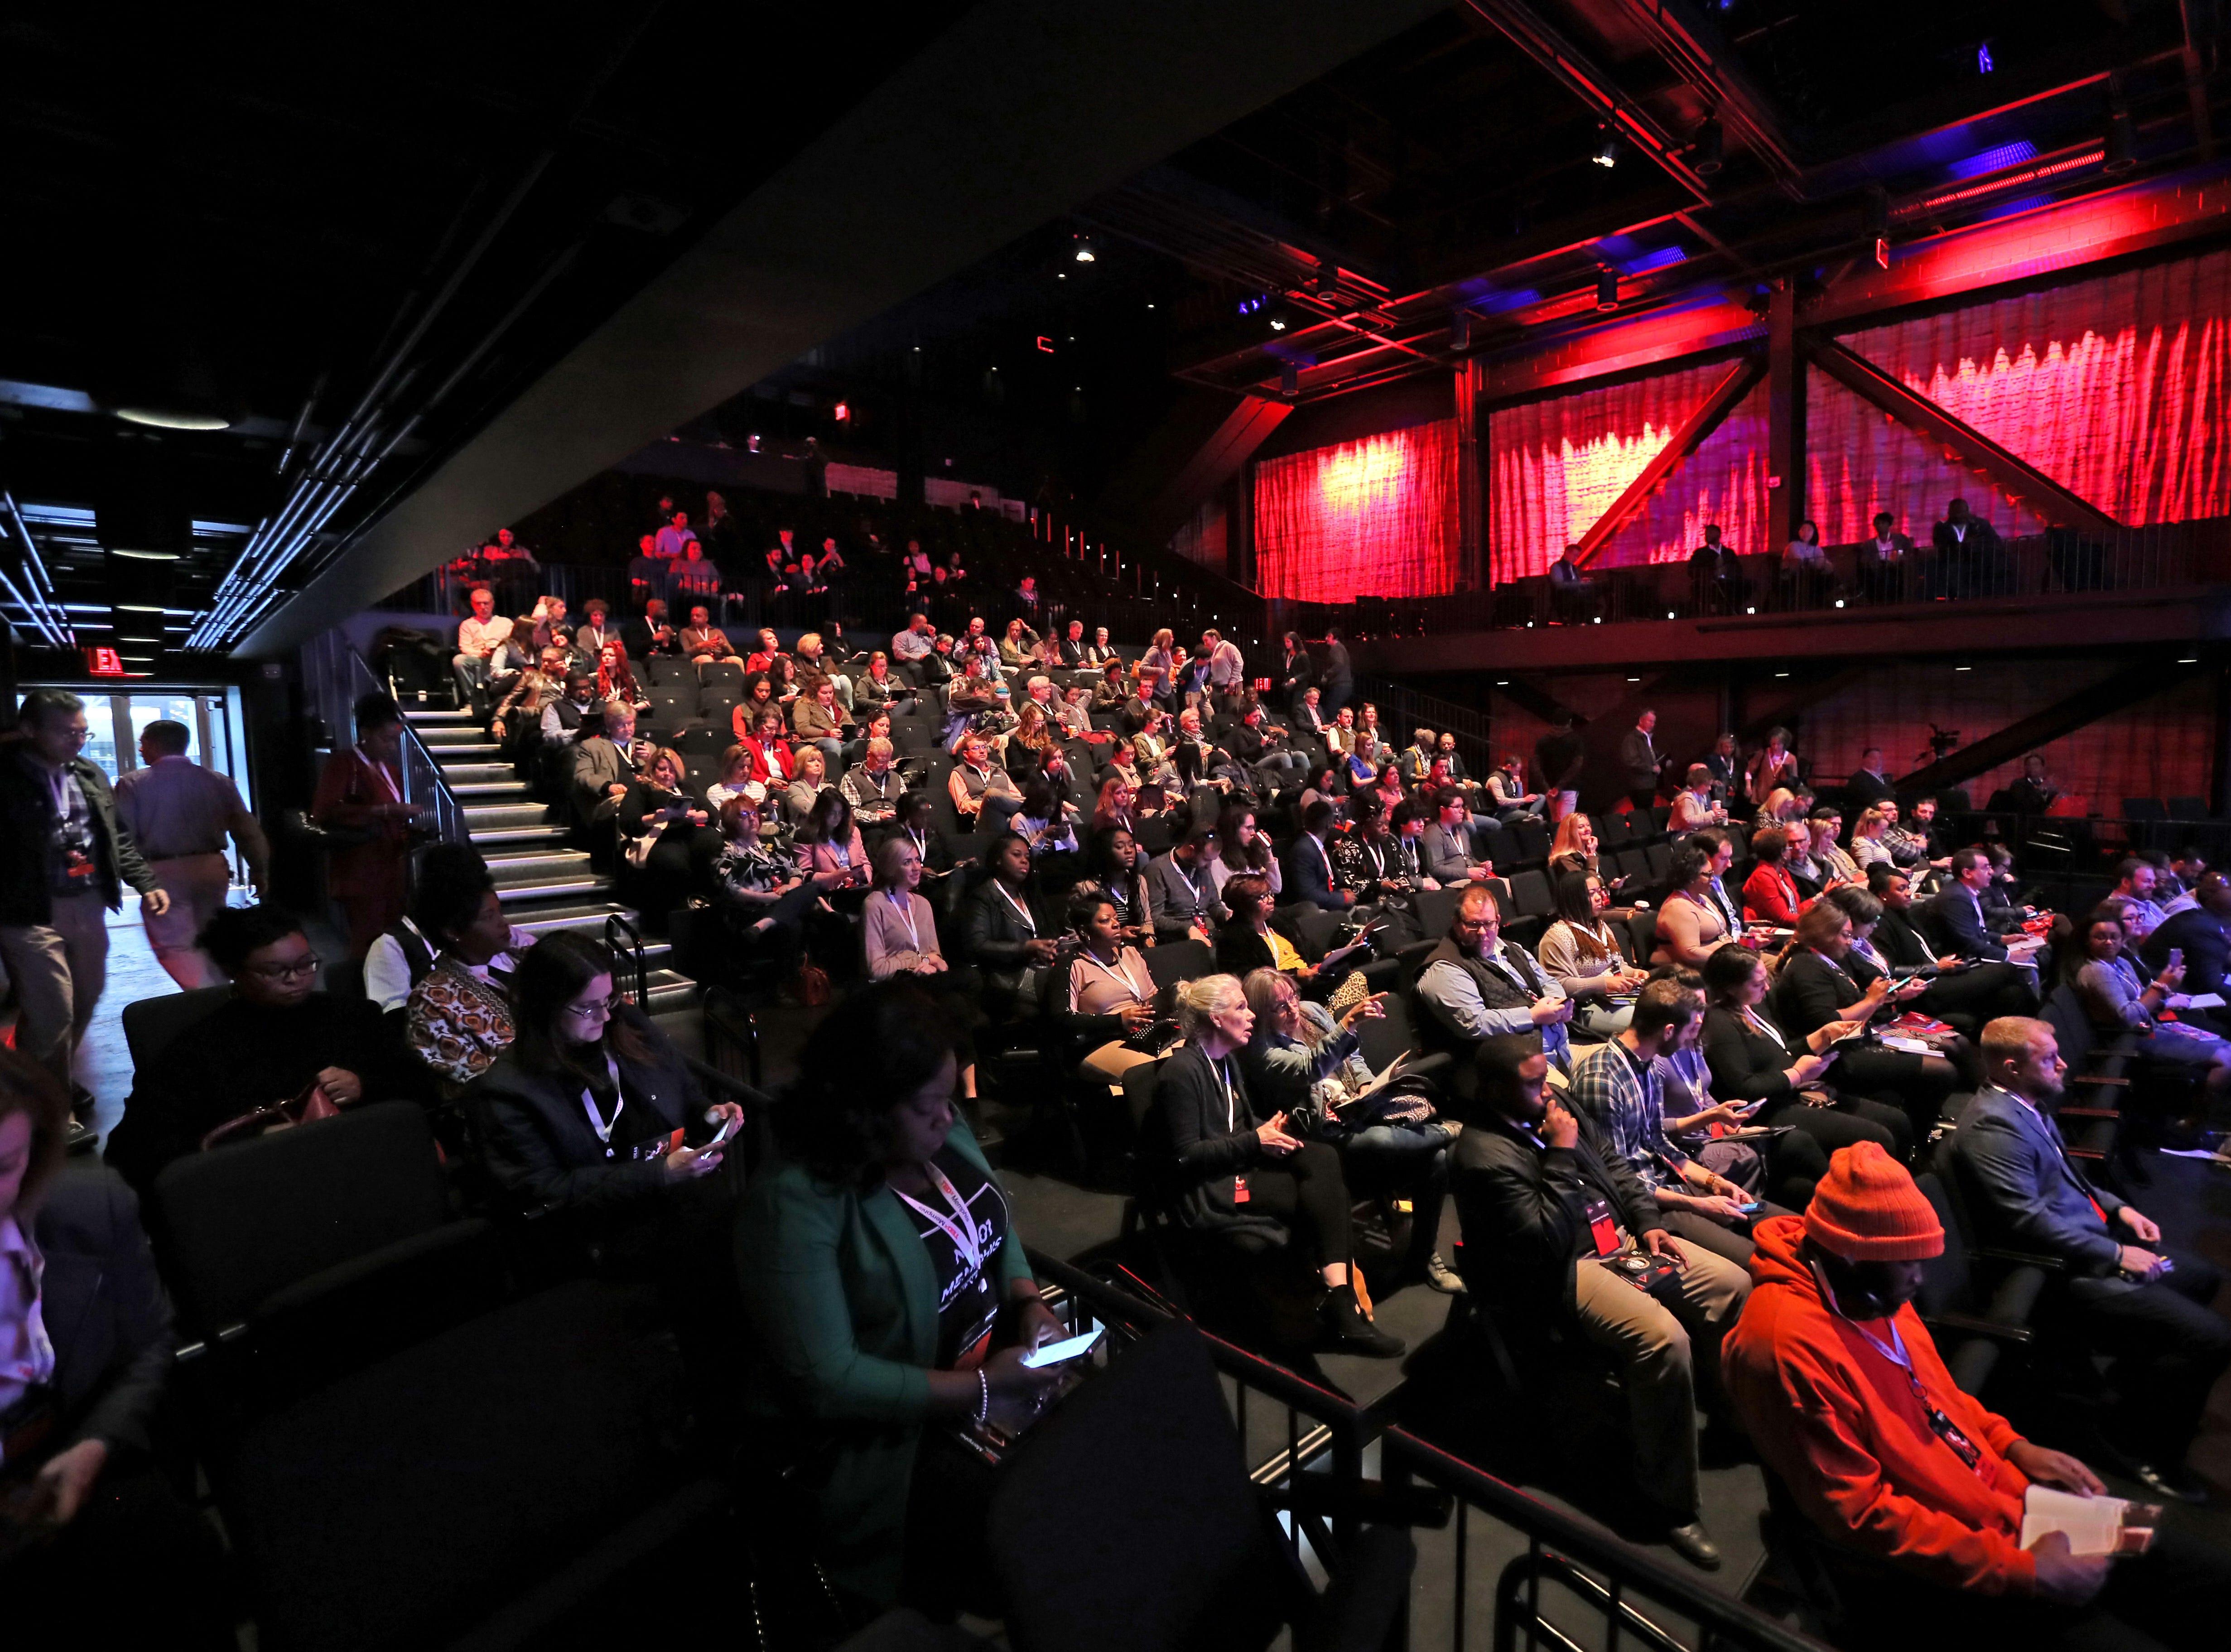 TEDx Memphis event at the Crosstown Arts Theatre Saturday, Feb. 2, 2019.